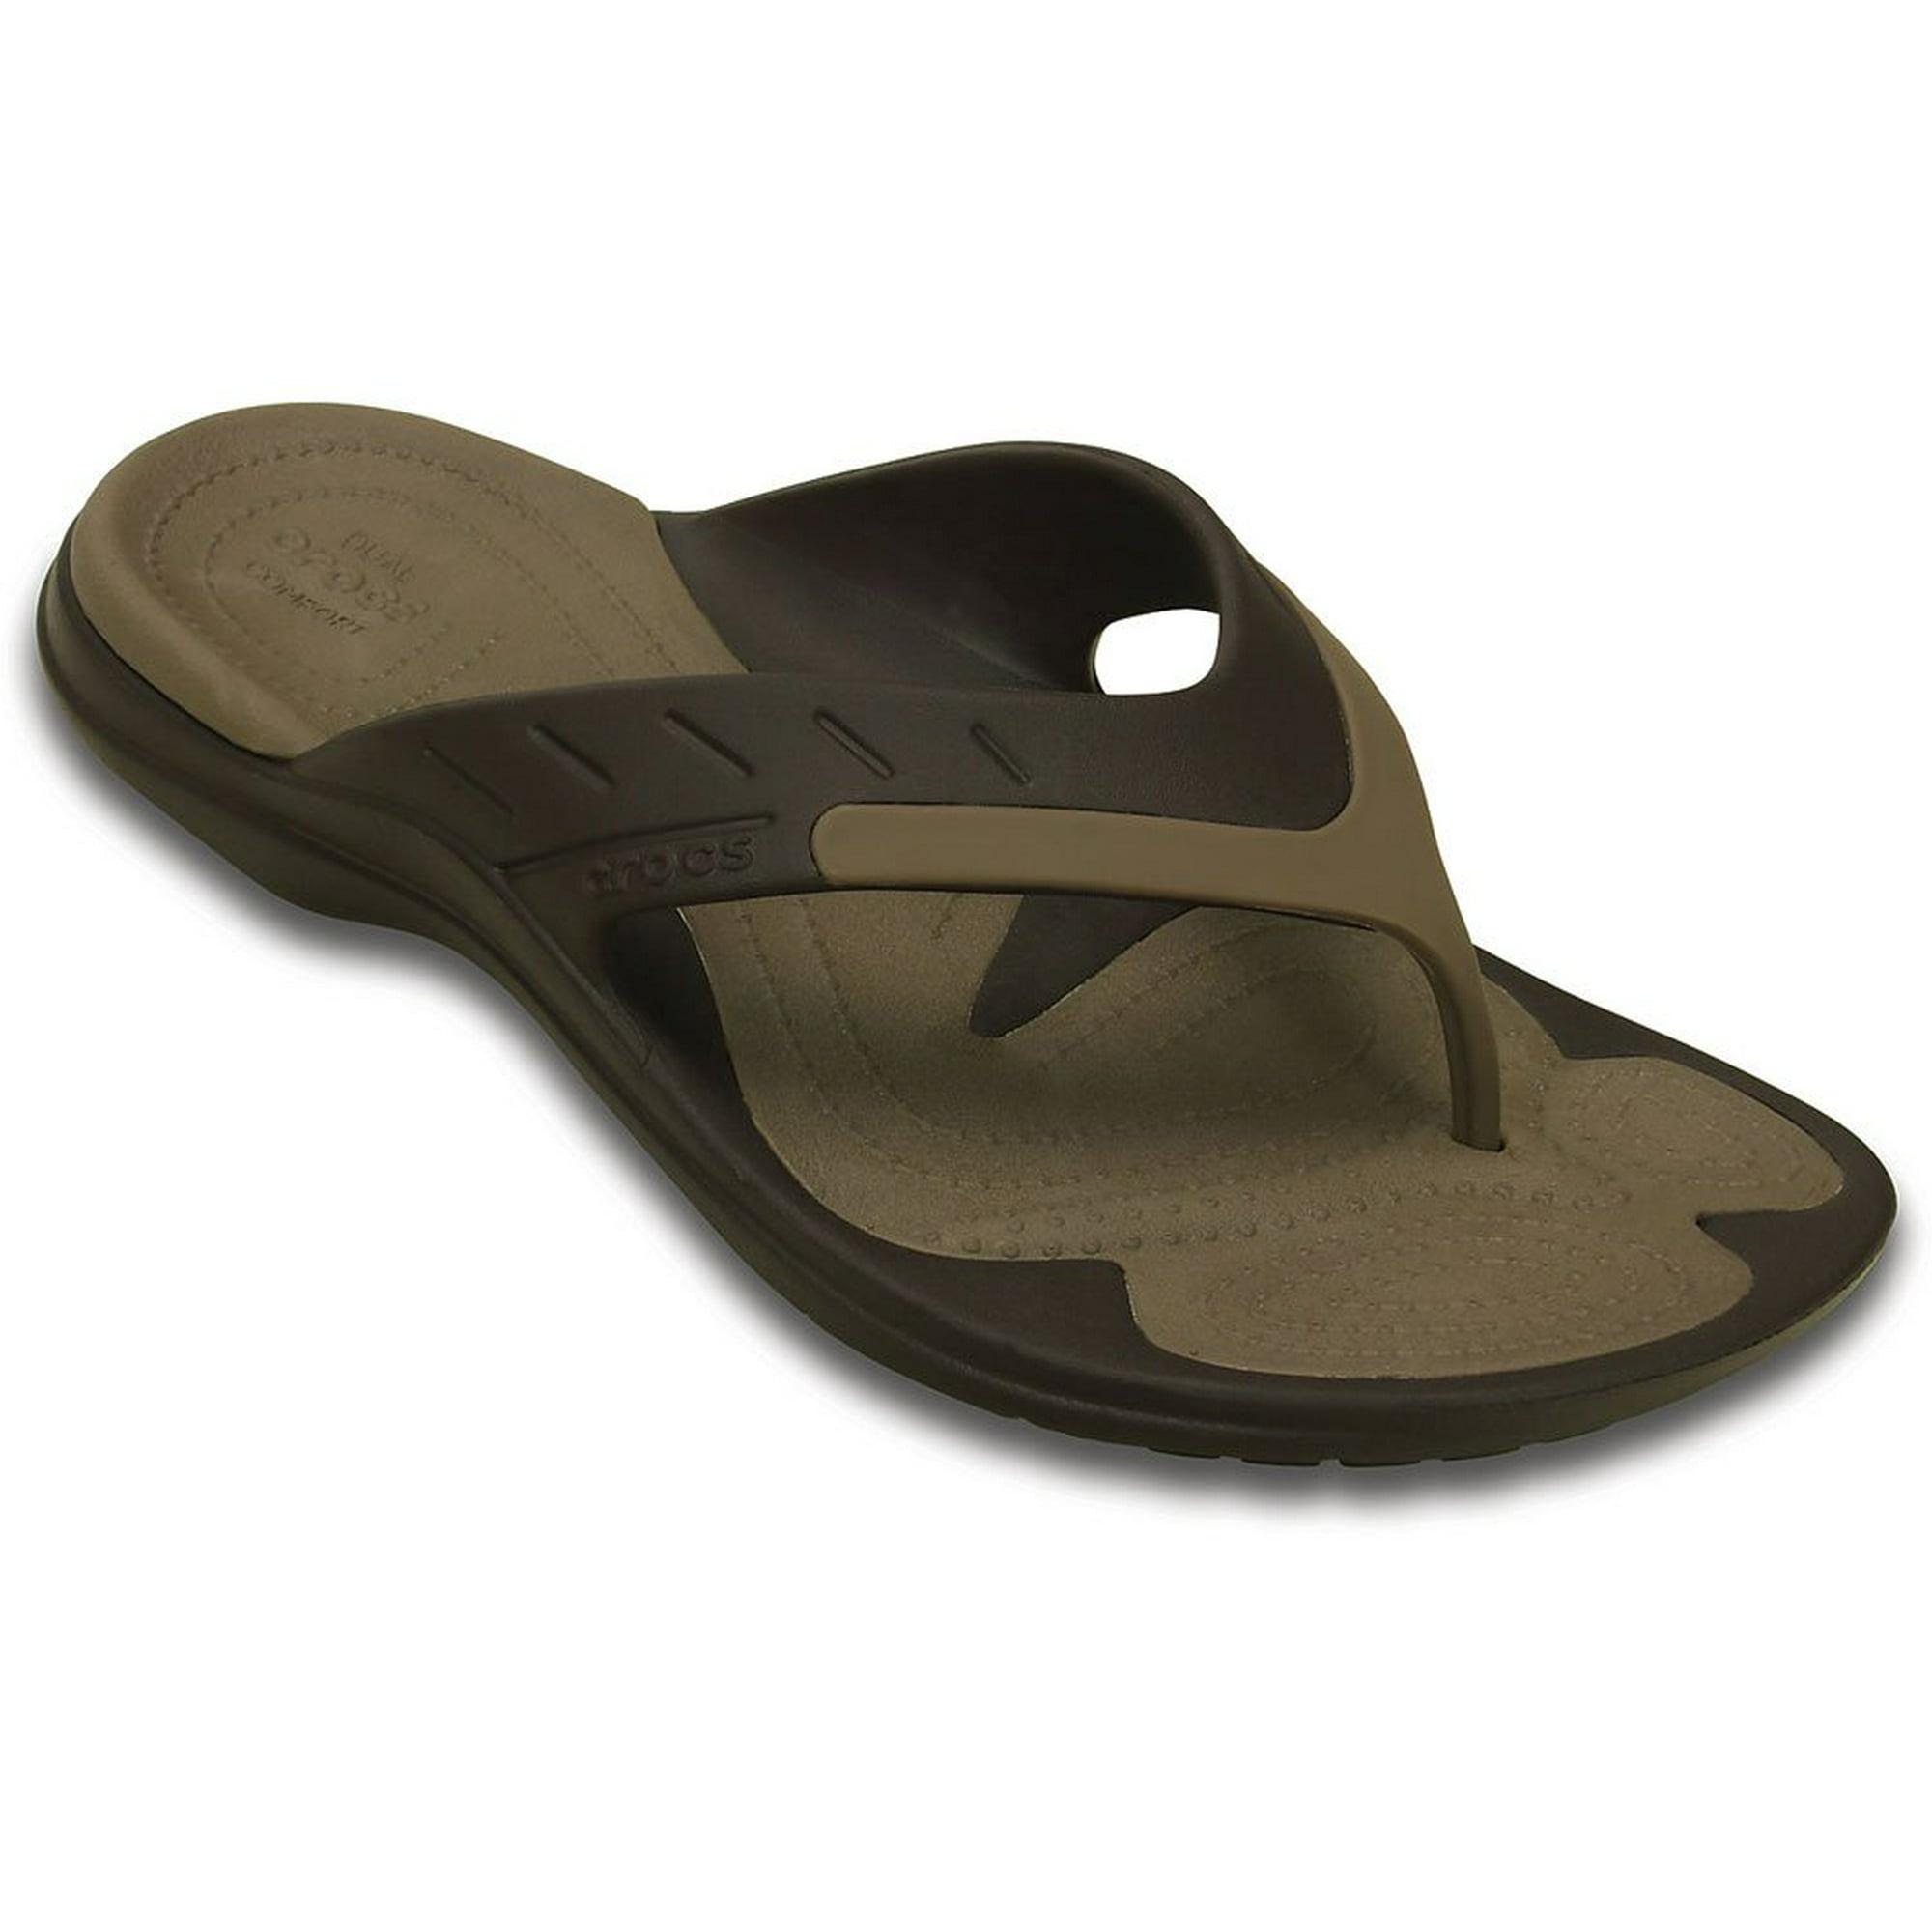 9e4d3d532 Buy Crocs Modi Sport Flip Sandal - Men s